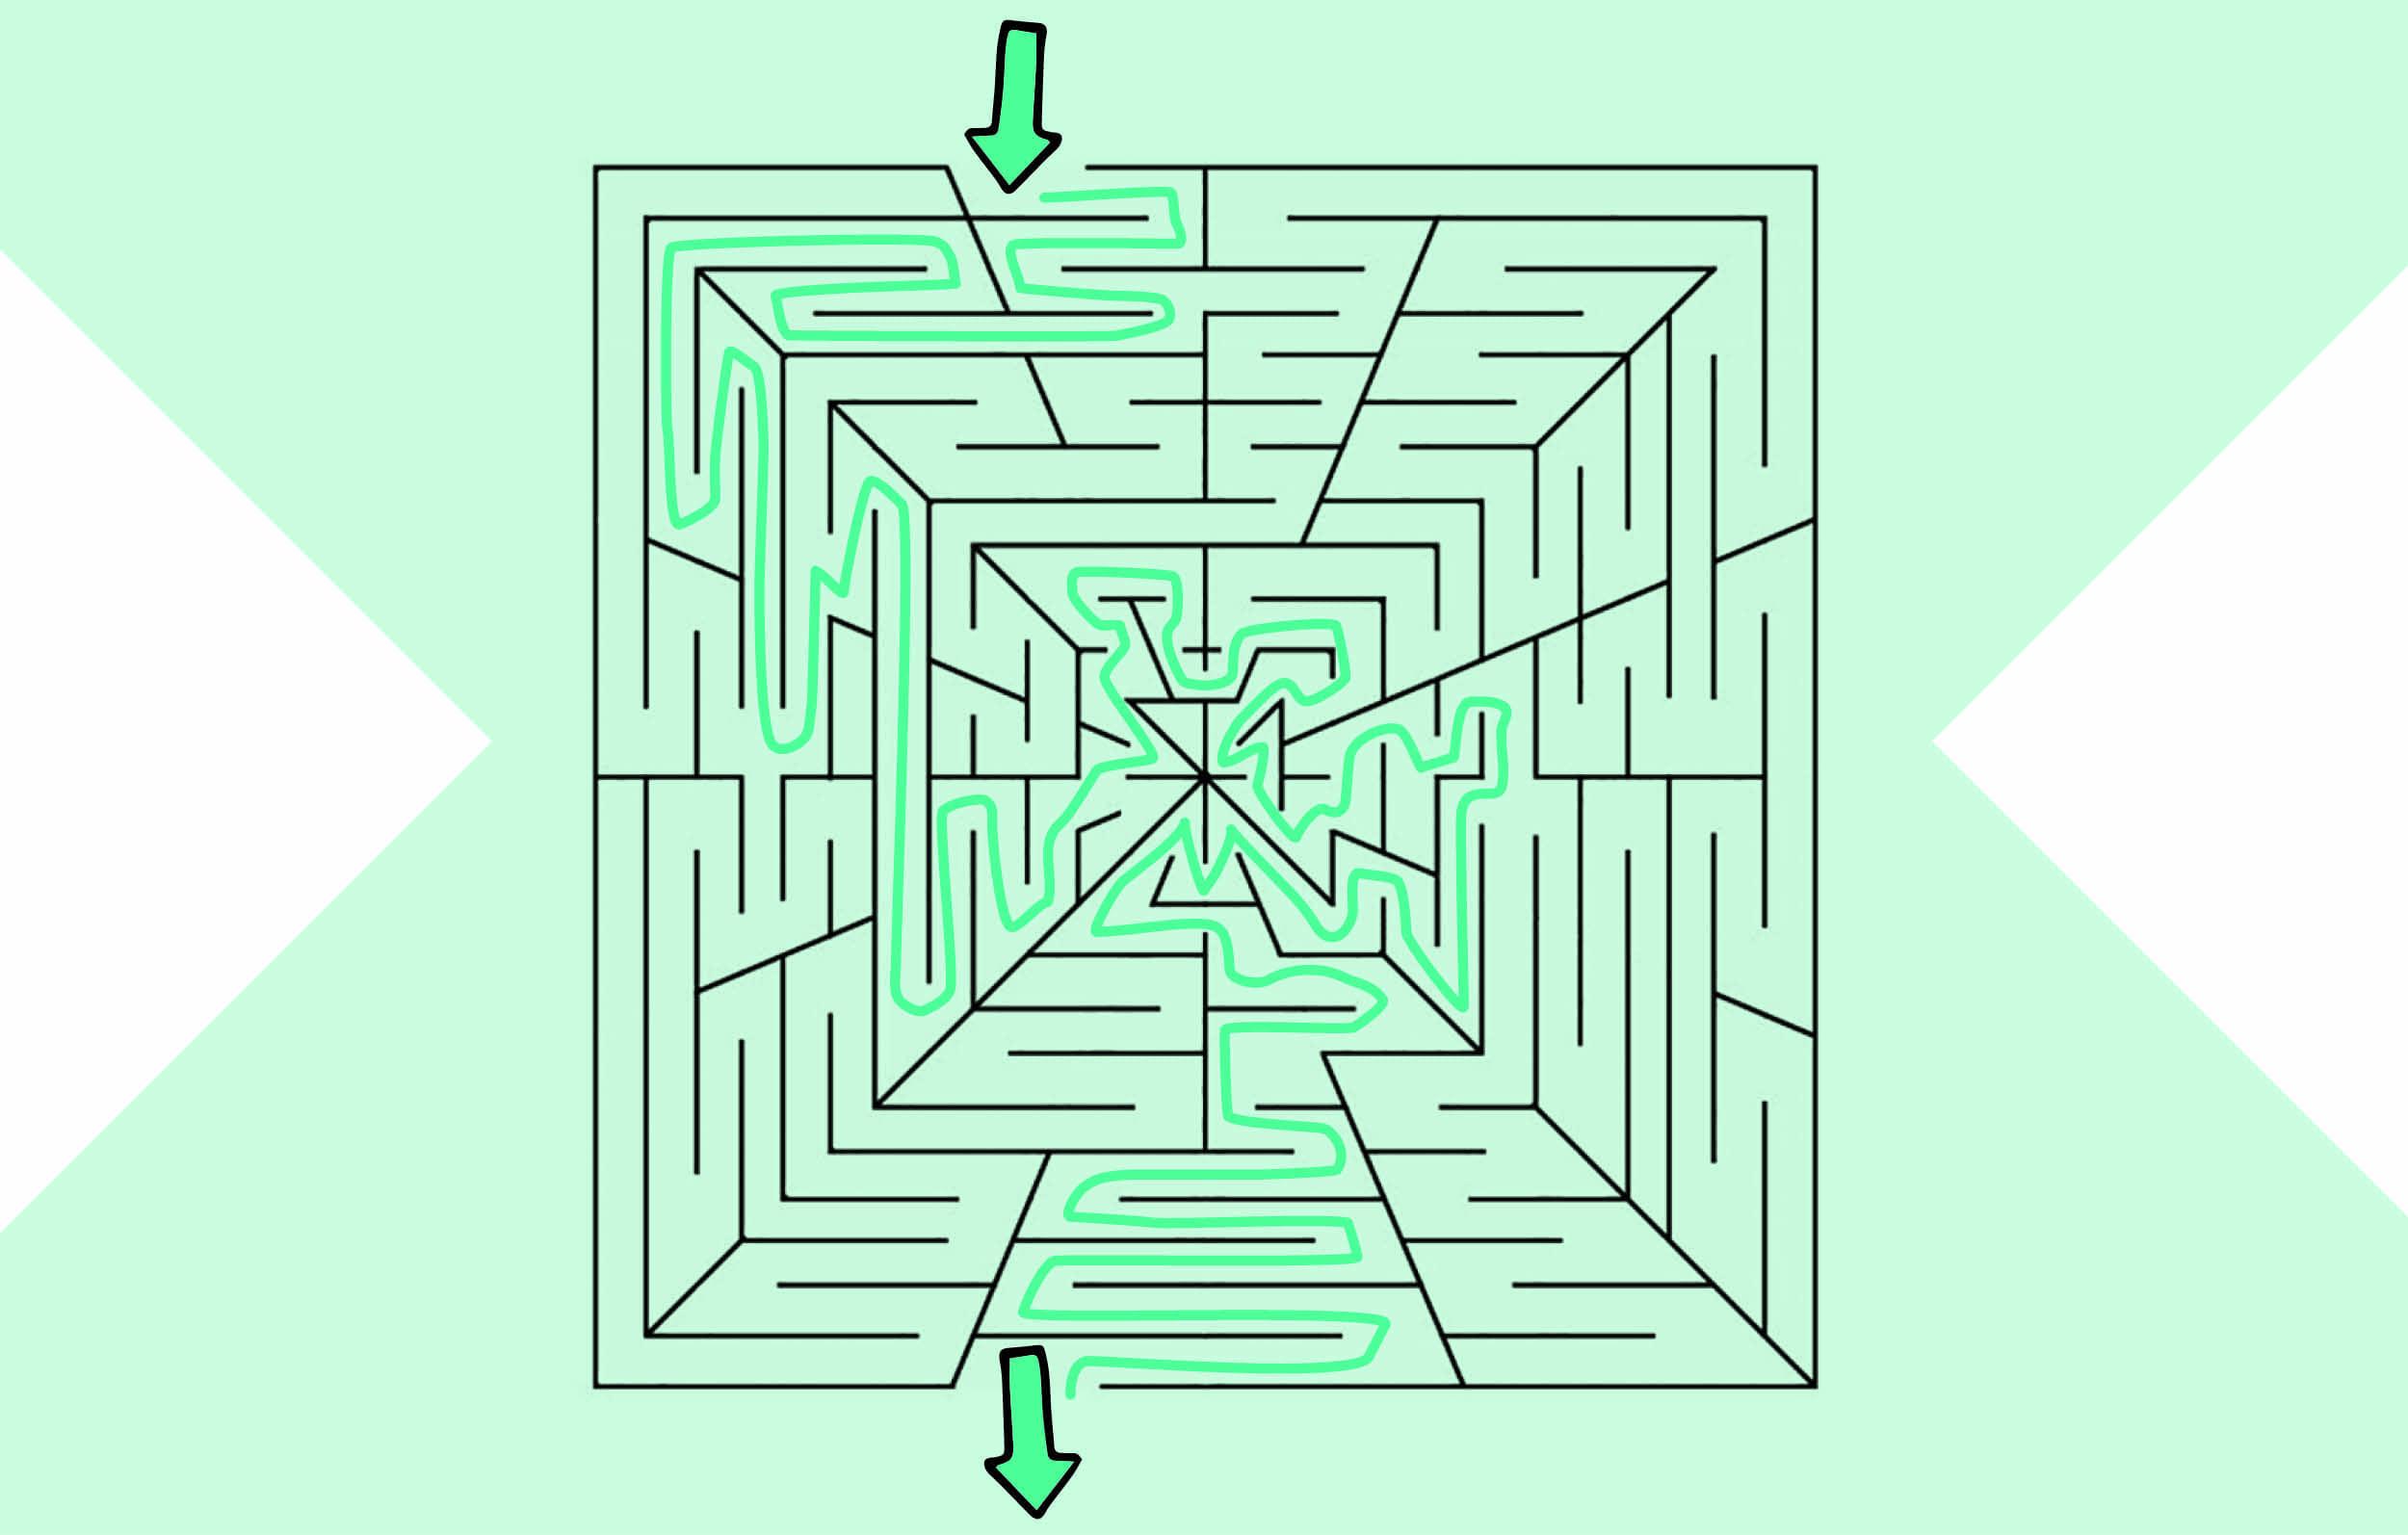 Labyrinthrätsel